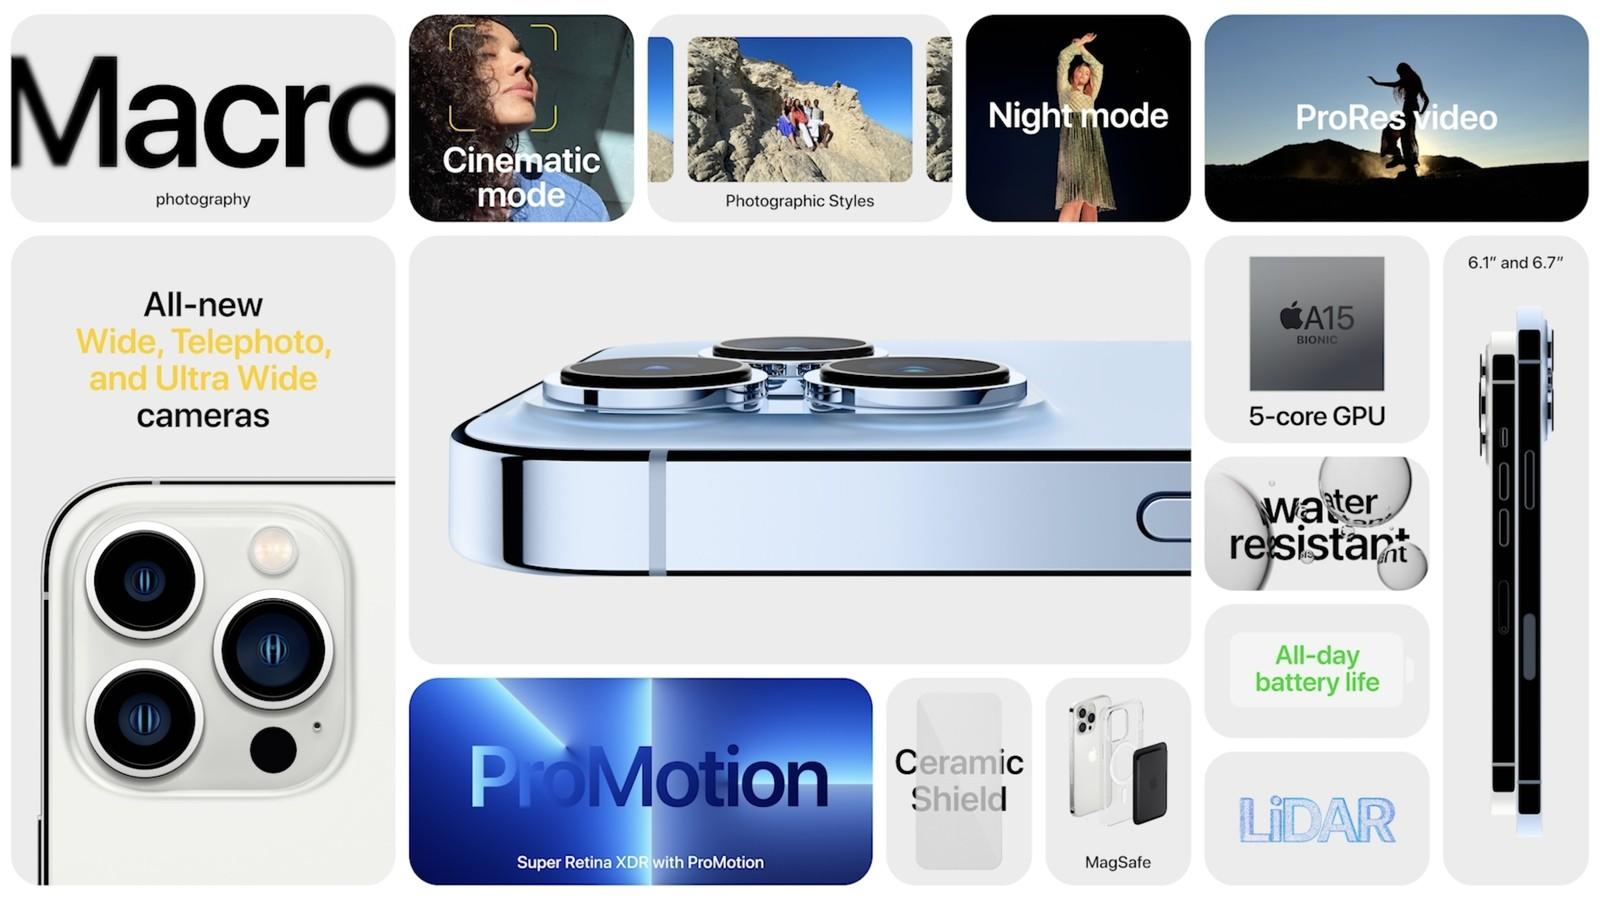 Взгляните на скрытые характеристики iPhone 13 (e q krtucaav4lu)